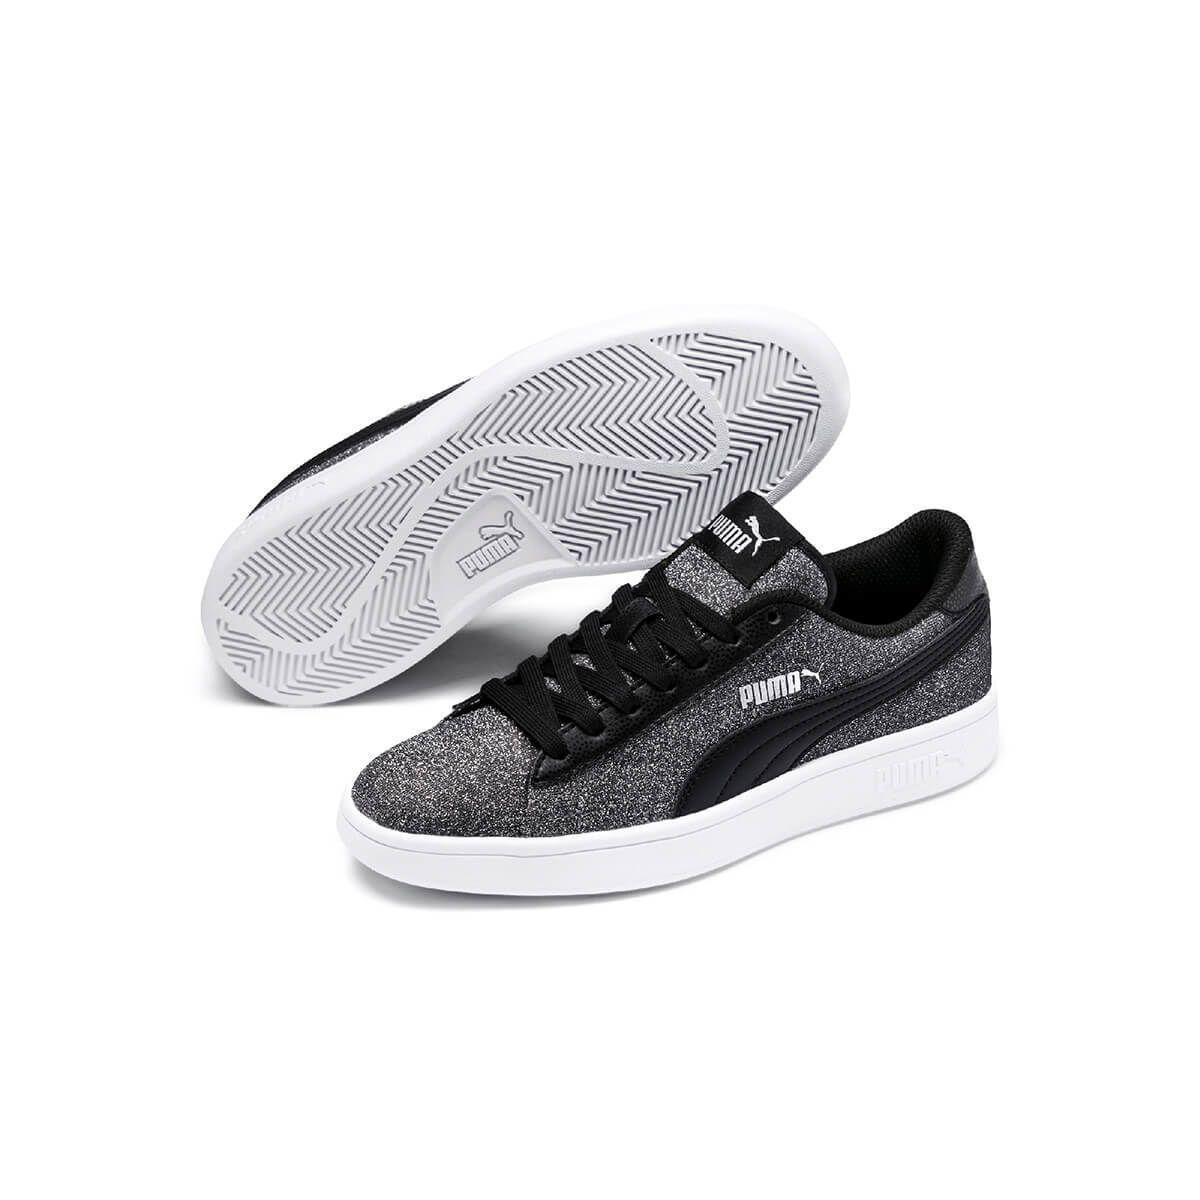 eae97797 Puma Puma Smash V2 Glitz Glam Siyah Gri Kadın Sneaker Ayakkabı in ...